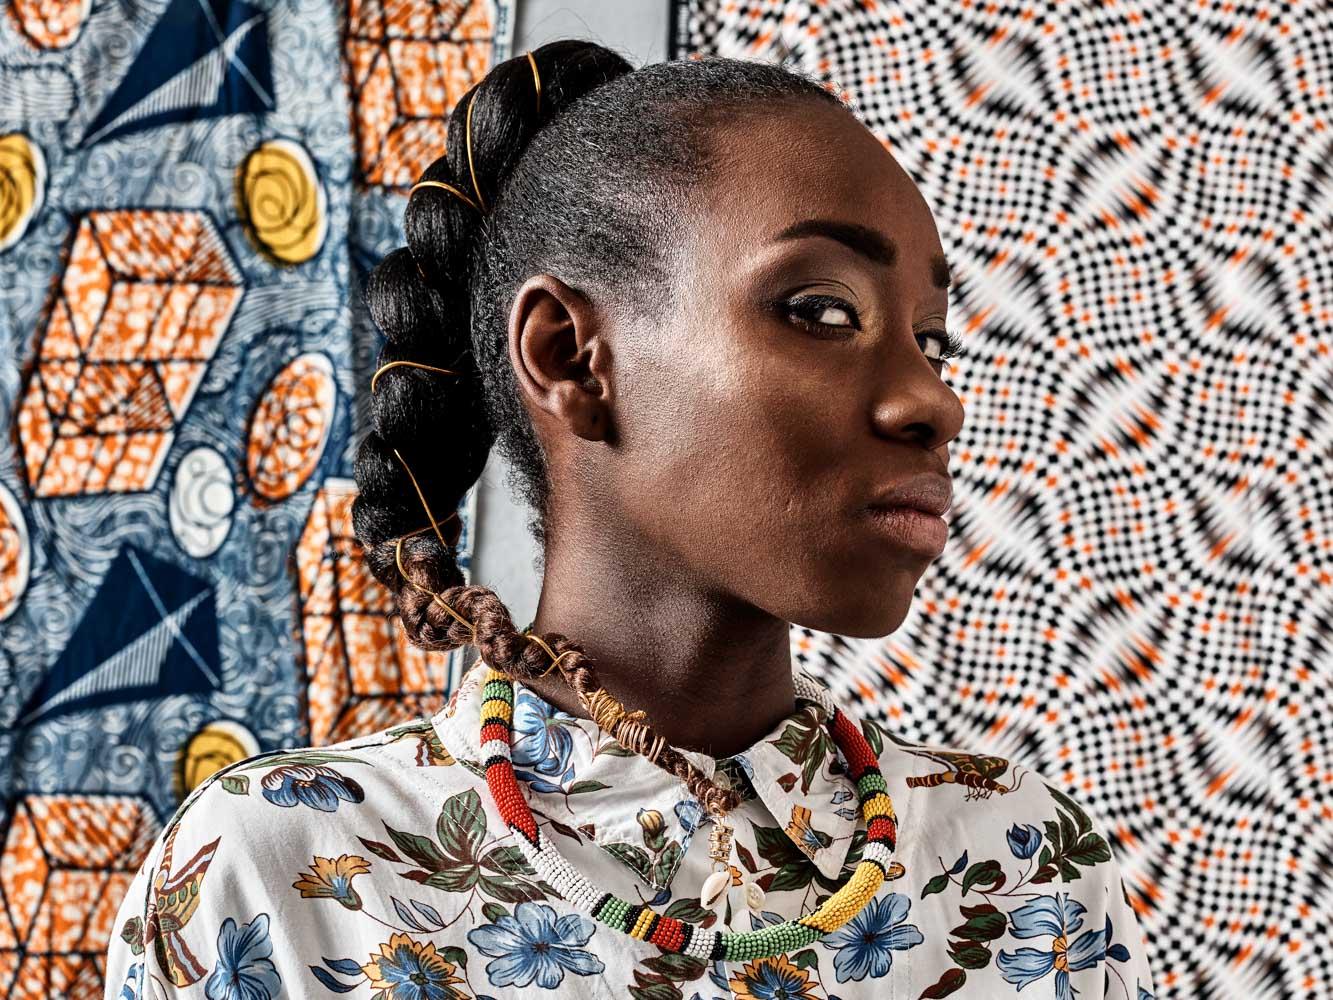 corporate_daniel_kummer-new_afro_2019-07